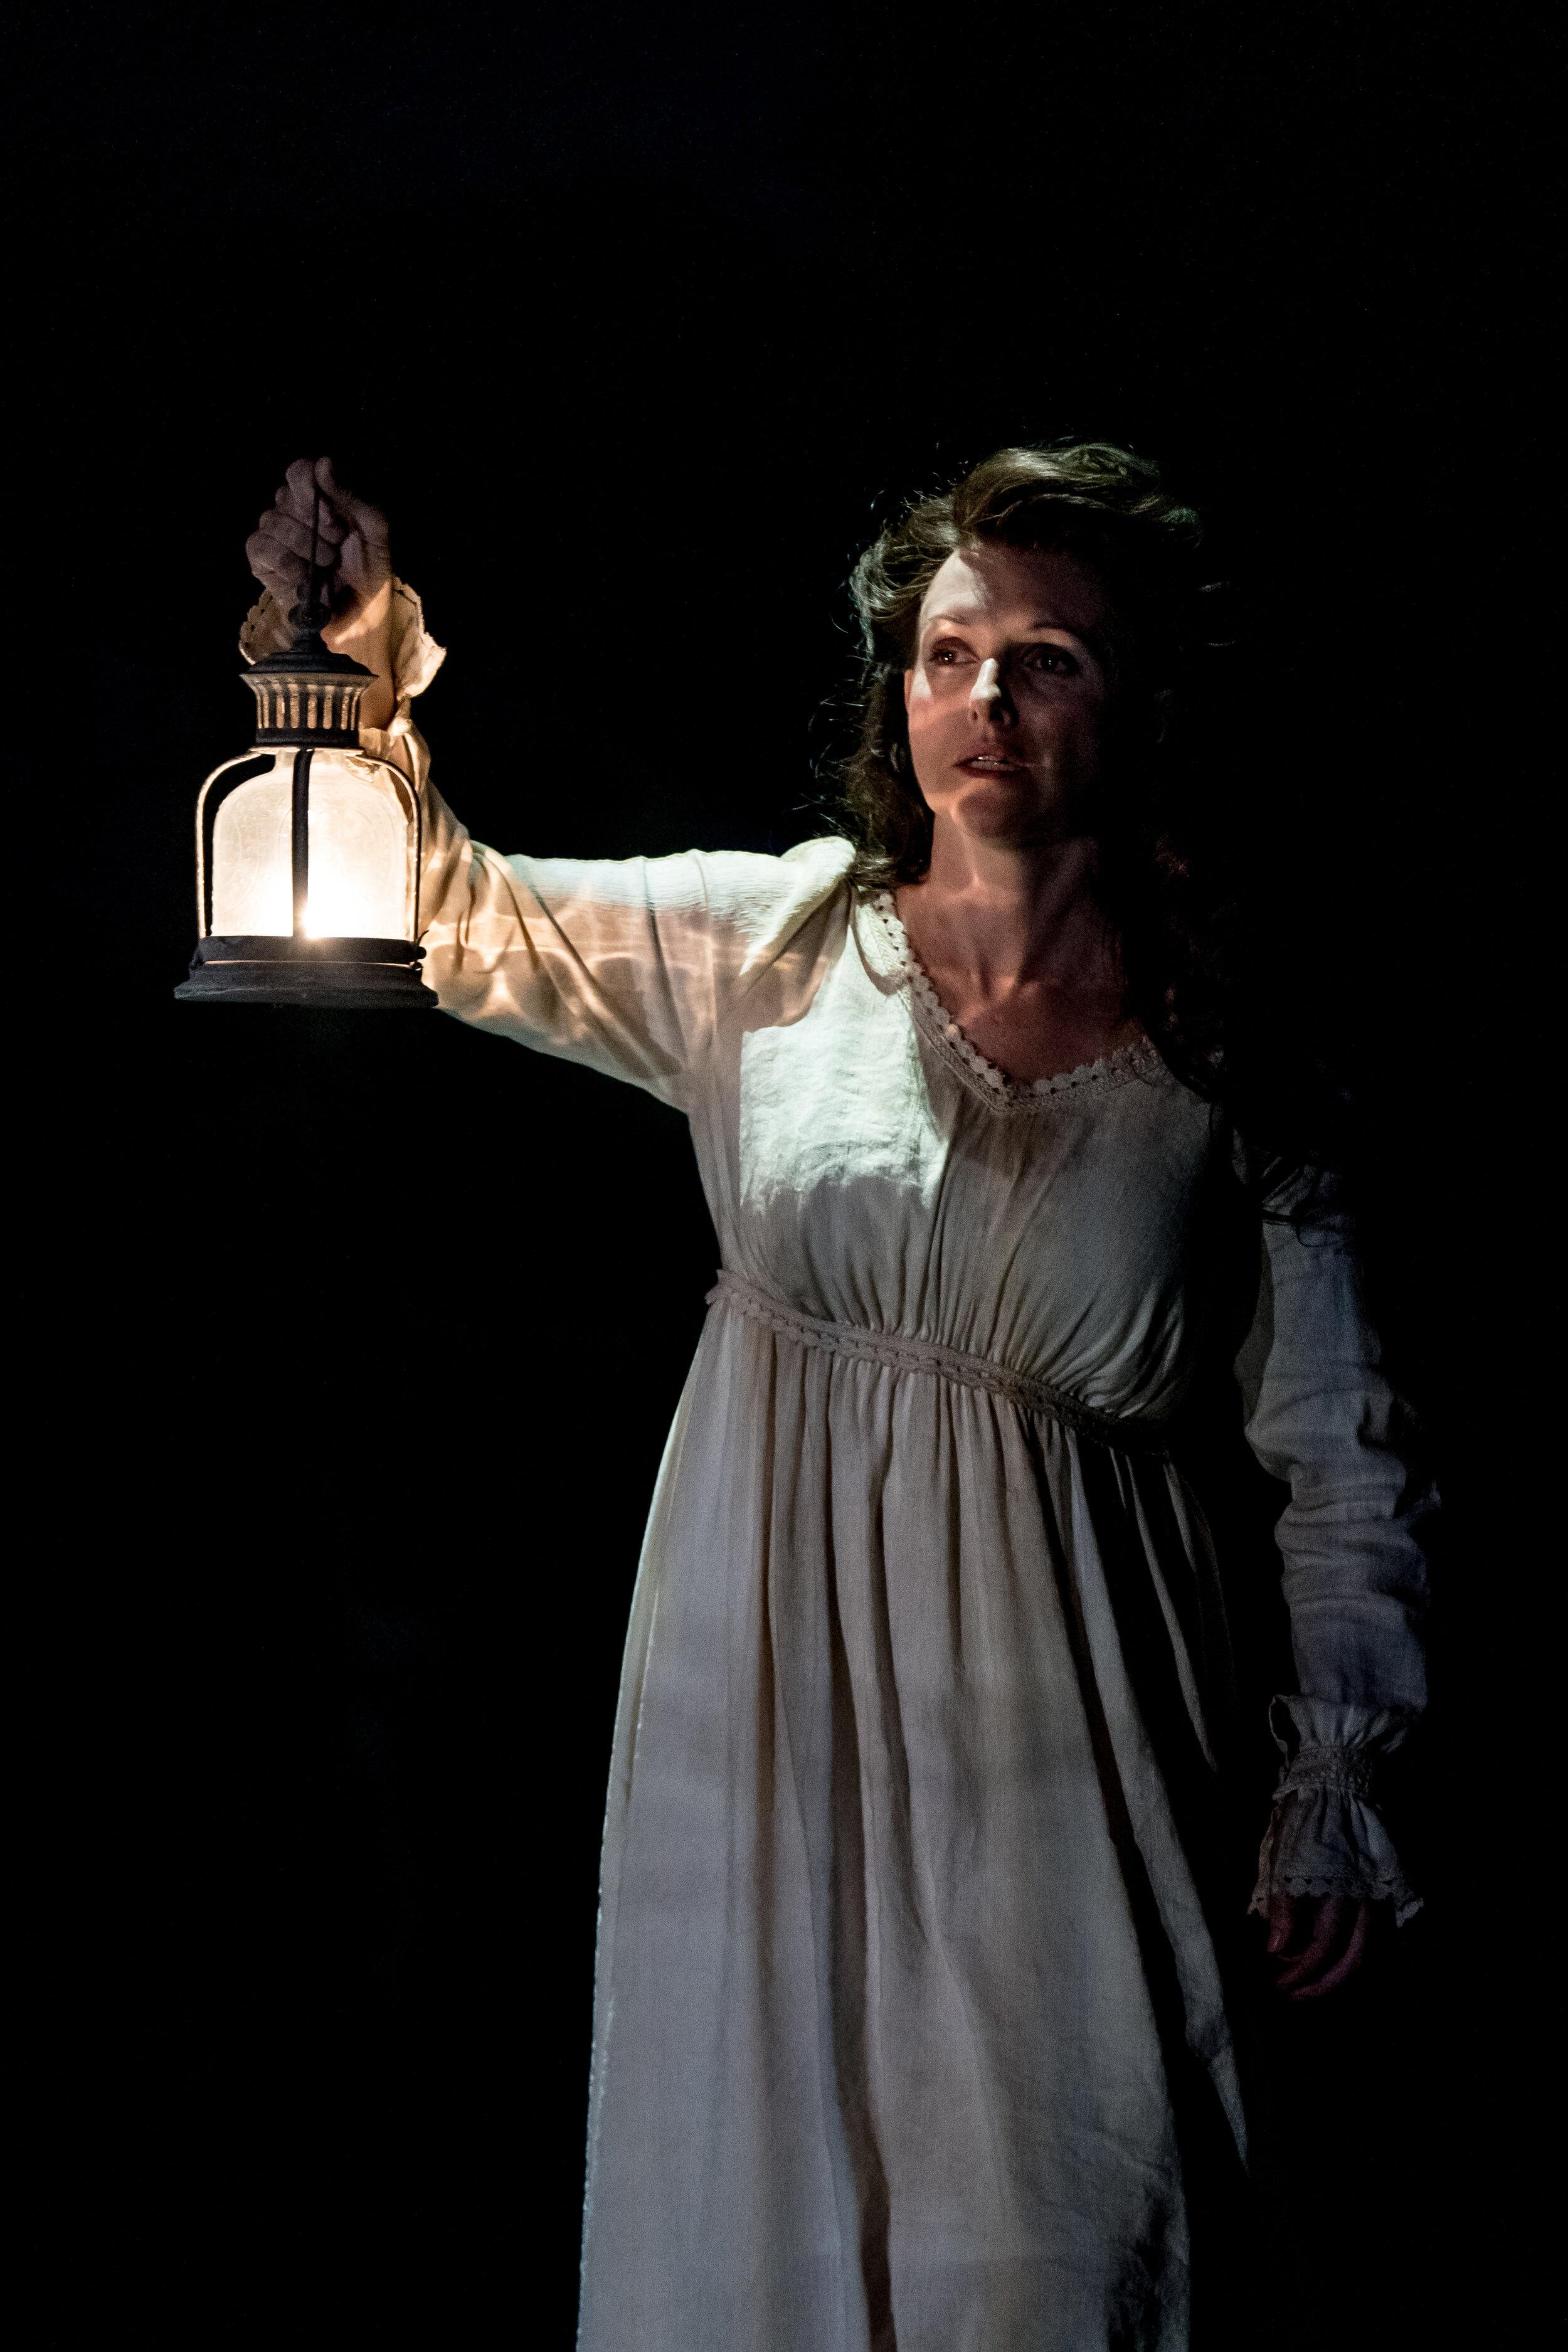 Dervla Kirwan as Lady Macbeth in MACBETH at Chichester Festival Theatre Photo Manuel Harlan-228.jpg